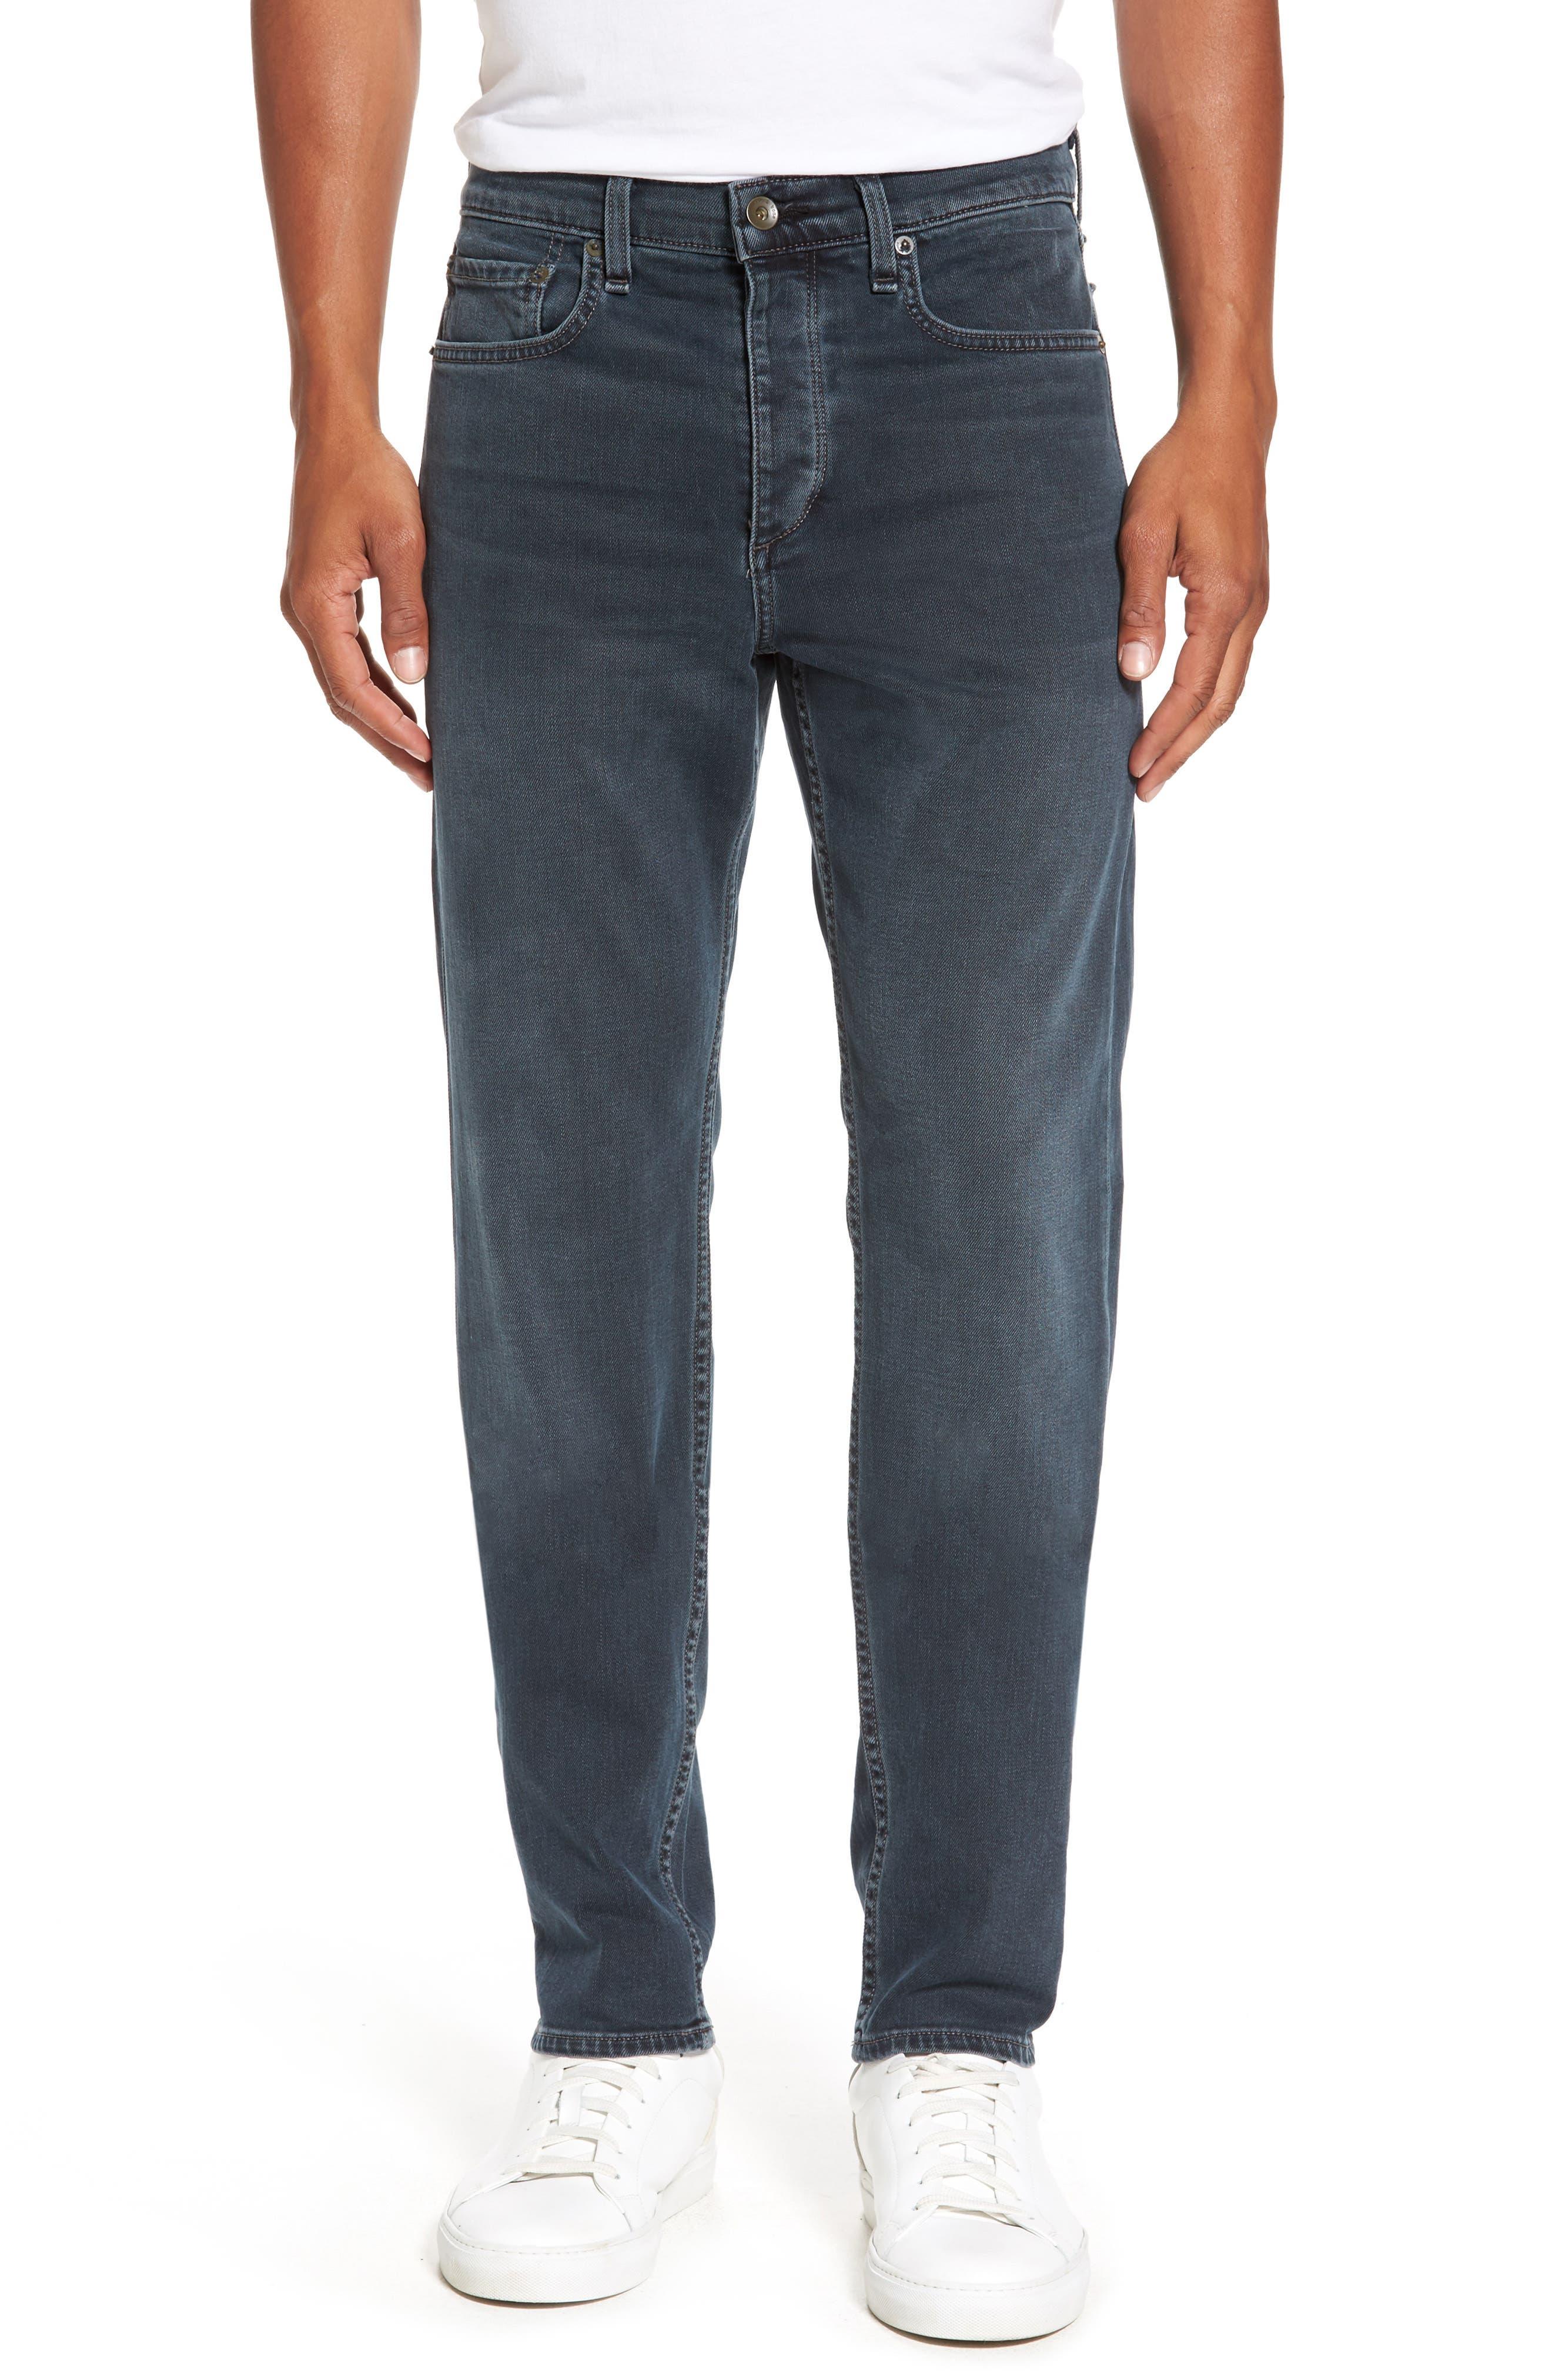 RAG & BONE Fit 2 Slim Fit Jeans, Main, color, MINNA